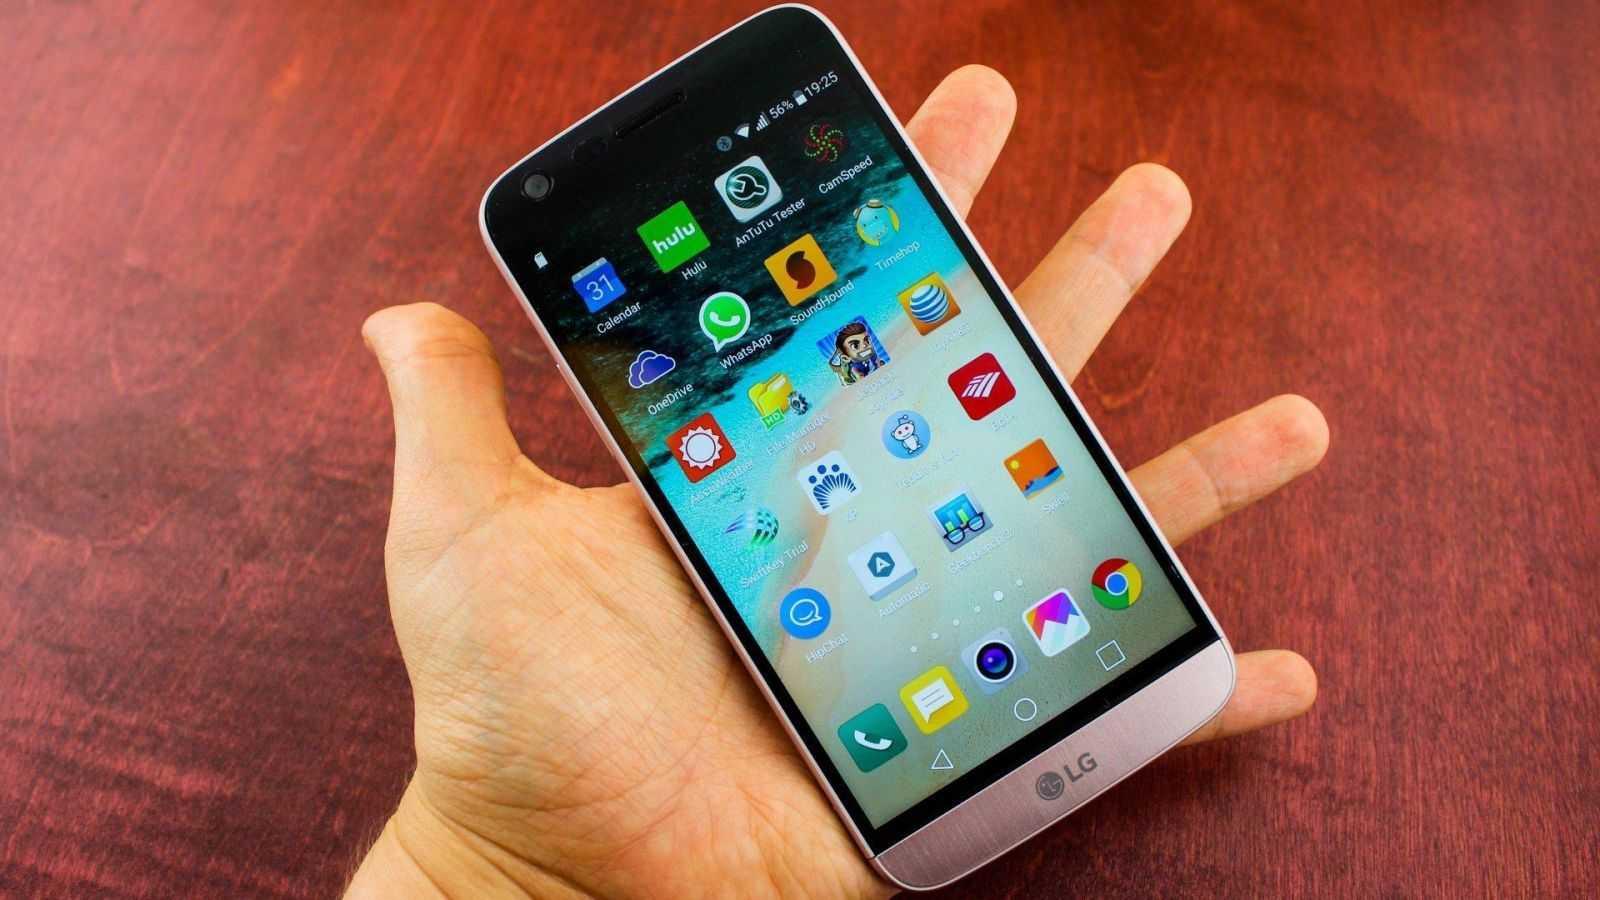 e41218632f98ea62526de7c2b1749e51 - MWC 2017. LG показала новый смартфон G6